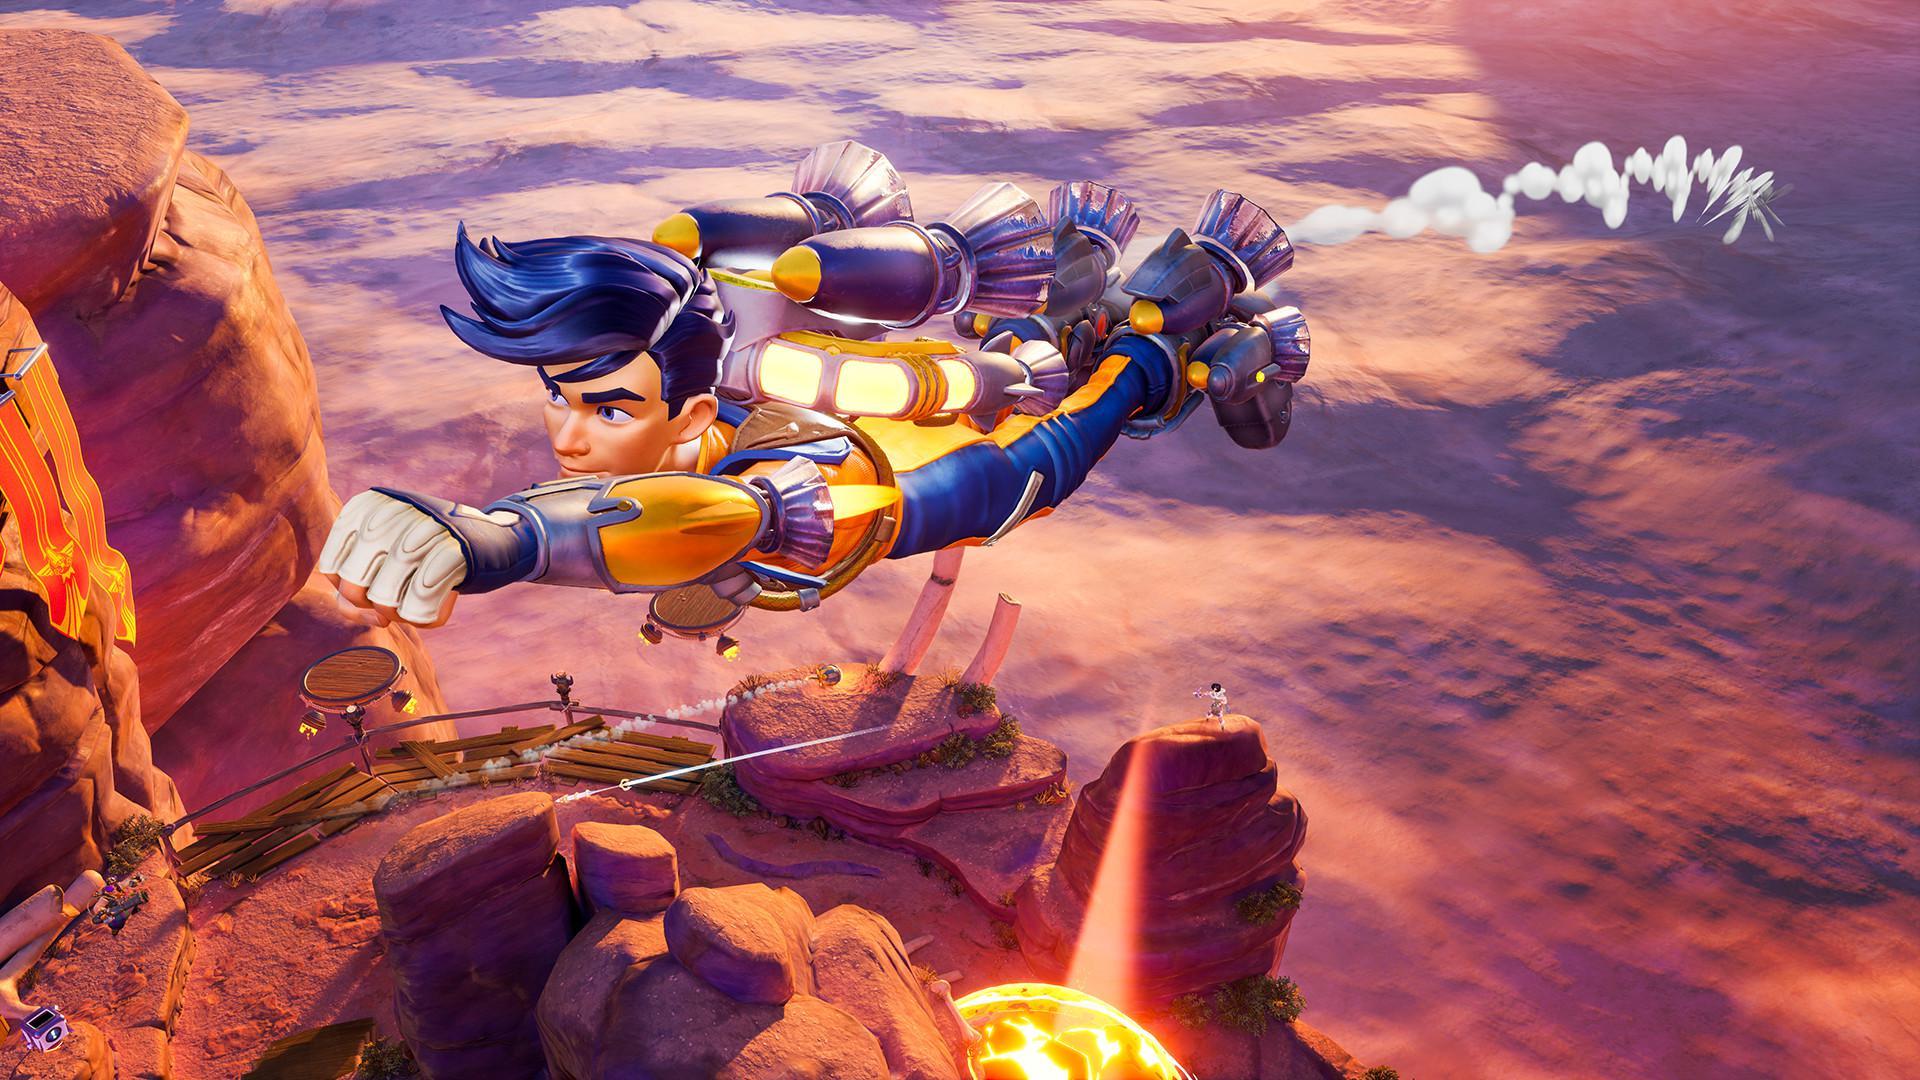 3V3射擊遊戲《火箭競技場》開啟免費試玩 8月3日截止